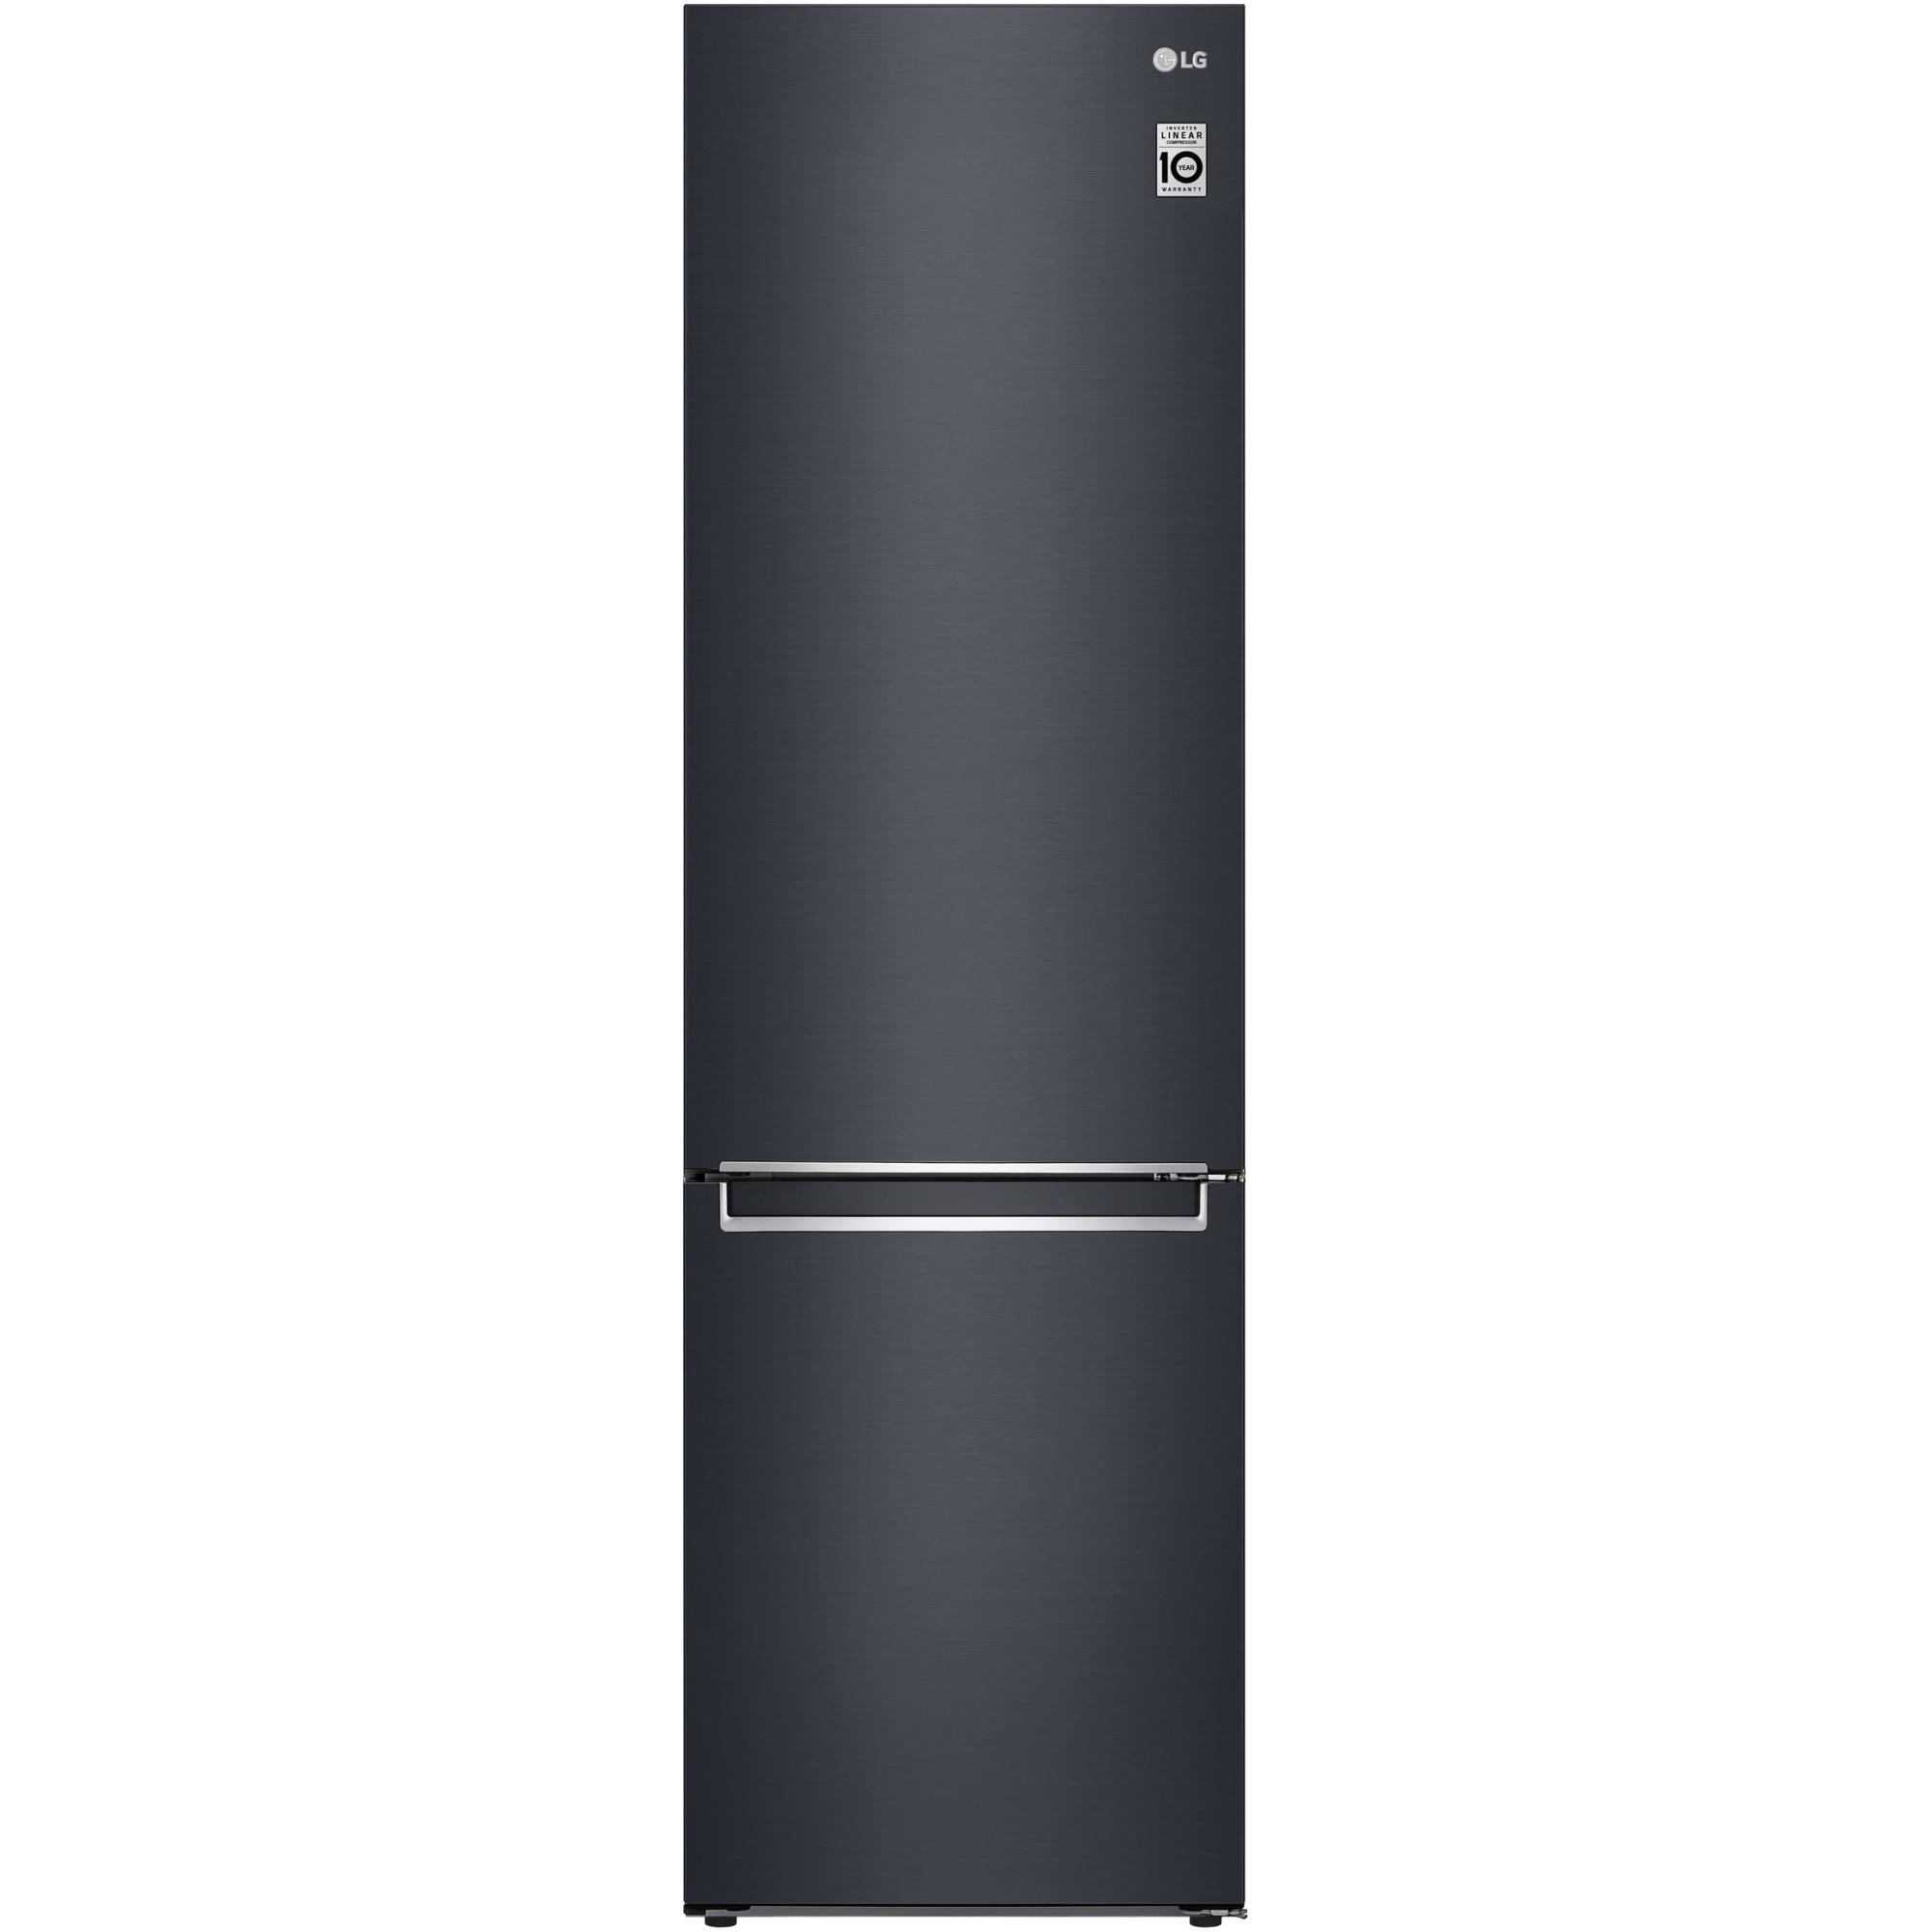 Fotografie Combina frigorifica LG GBP72MCVFN, 384 l, Clasa A+++, No Frost, Compresor Liniar Inverter, NatureFresh, DoorCooling, Afisaj LED, H 203 cm, Negru